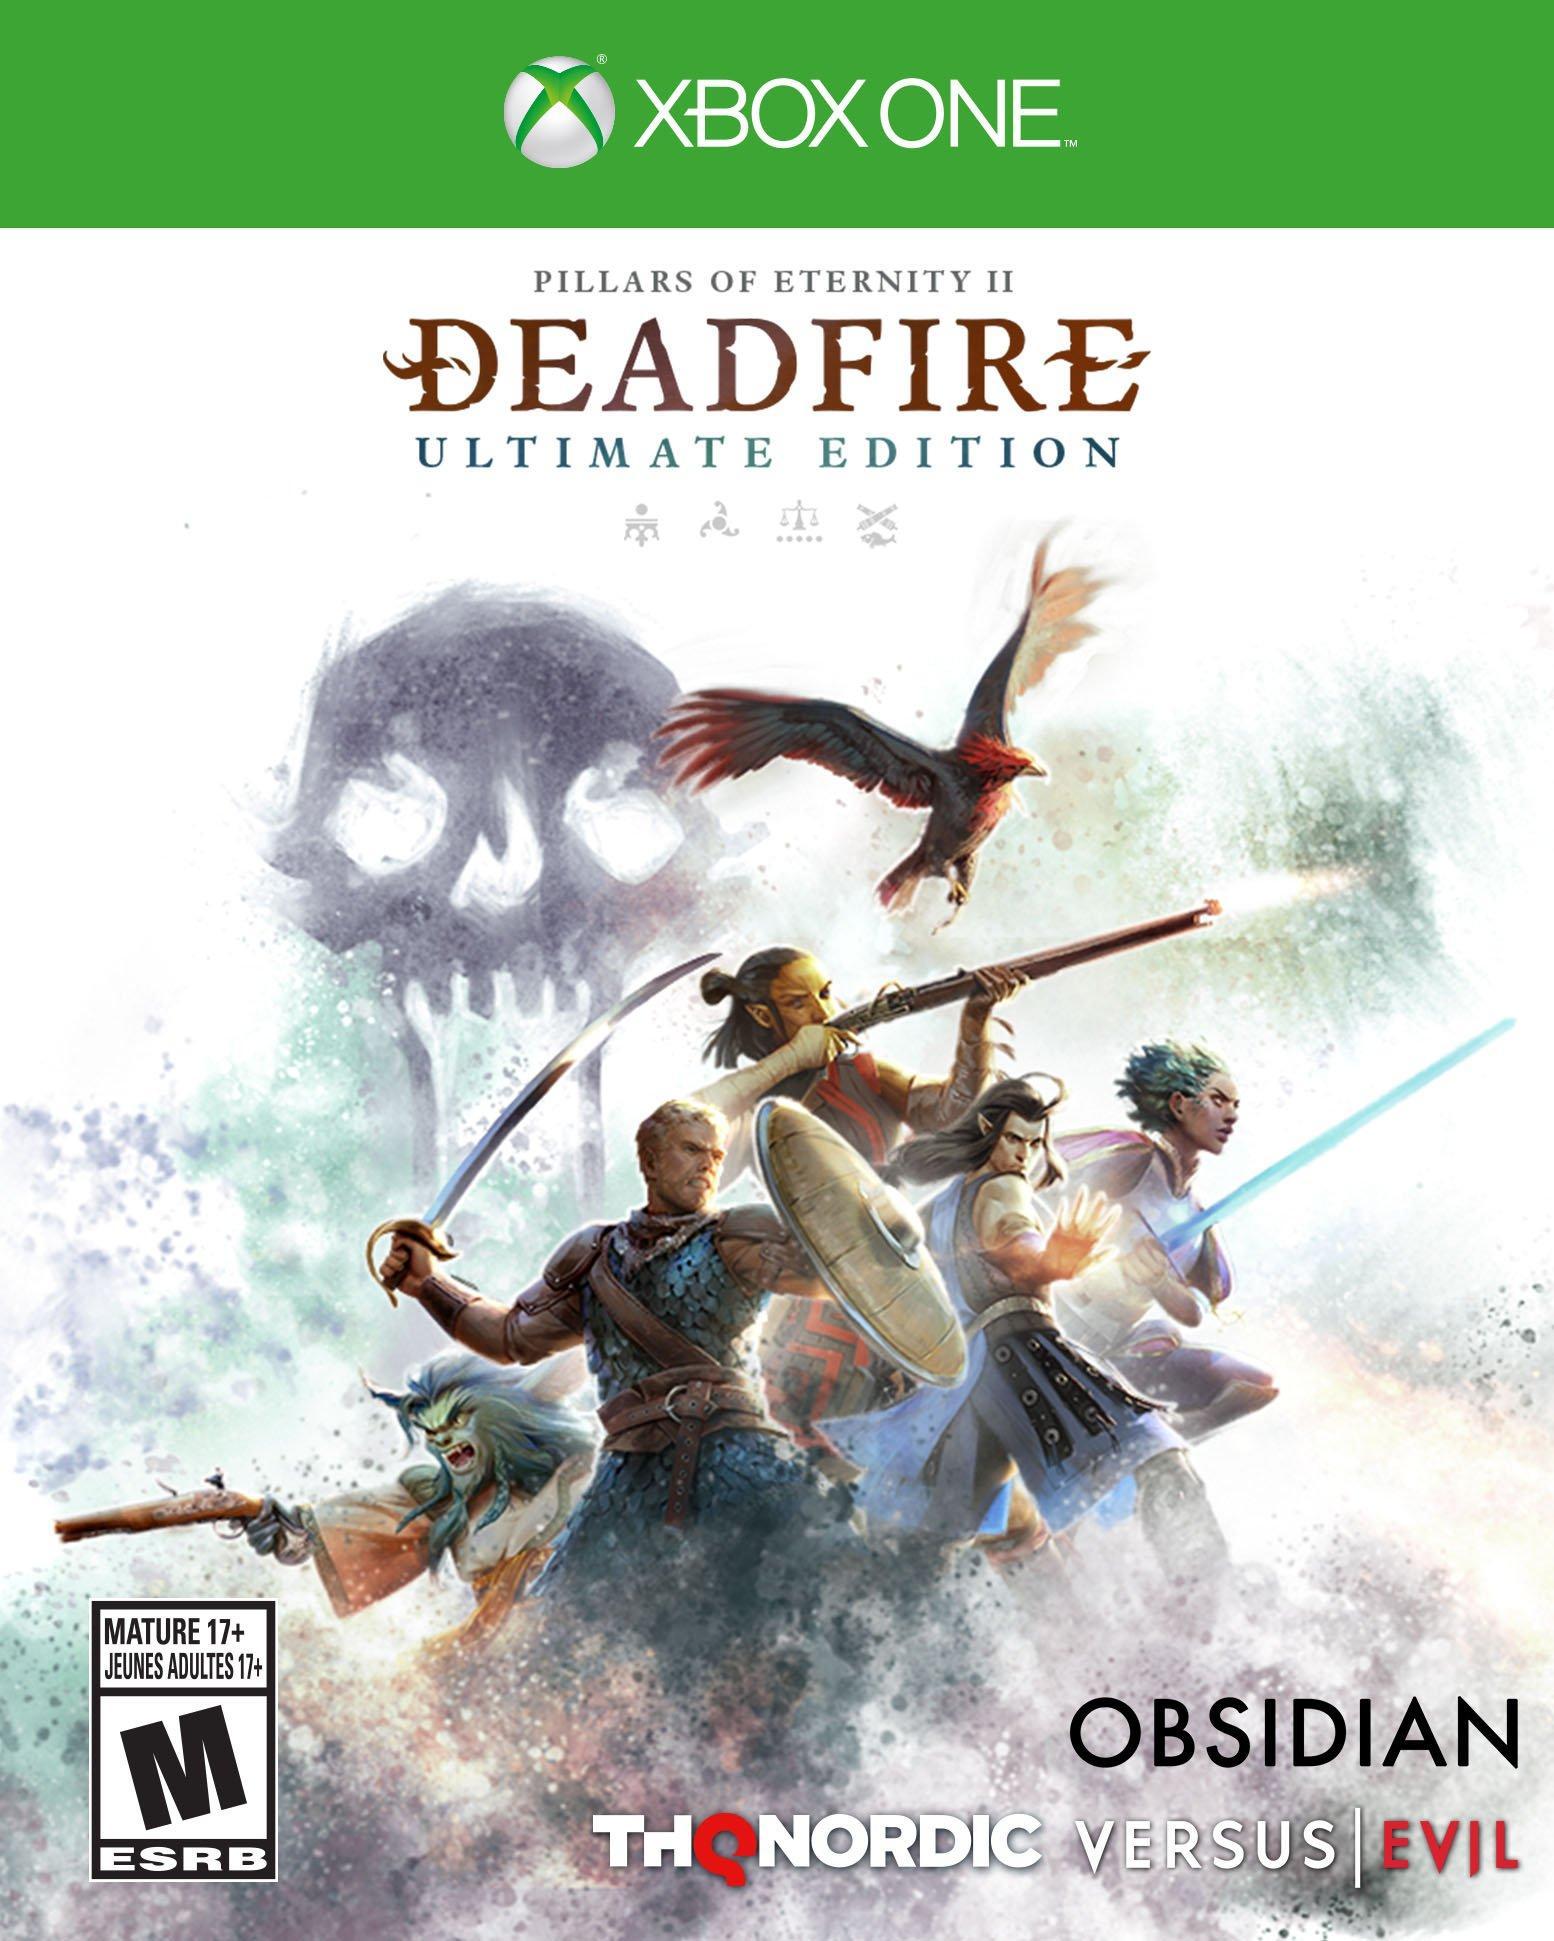 Pillars of Eternity II: Deadfire | Xbox One | GameStop